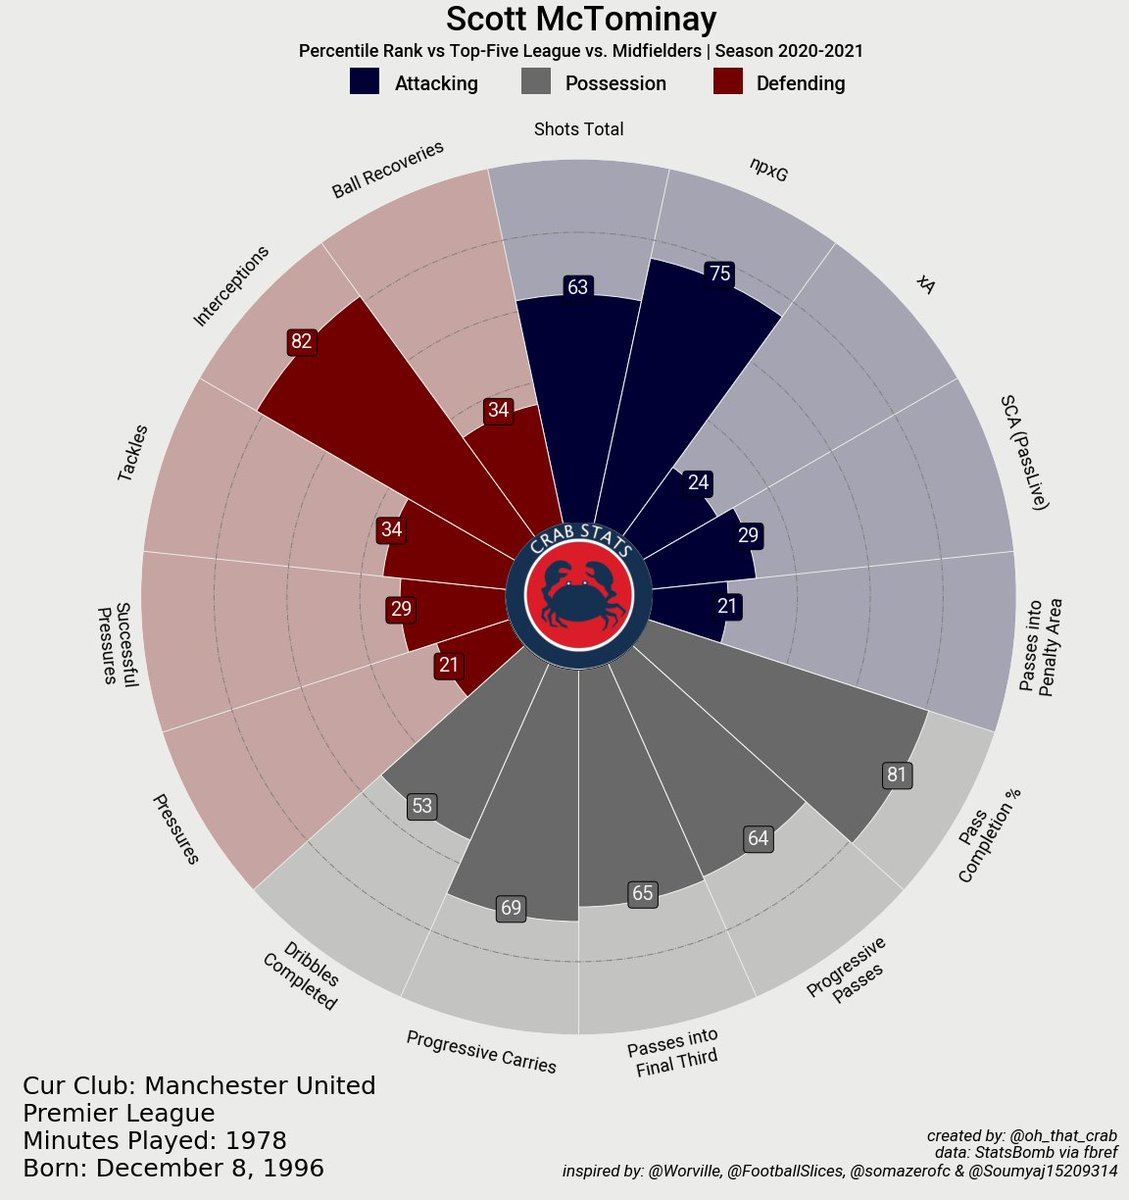 Scott McTominay - 2020-2021 vs. Midfielders slice https://t.co/GKwlx3blsf